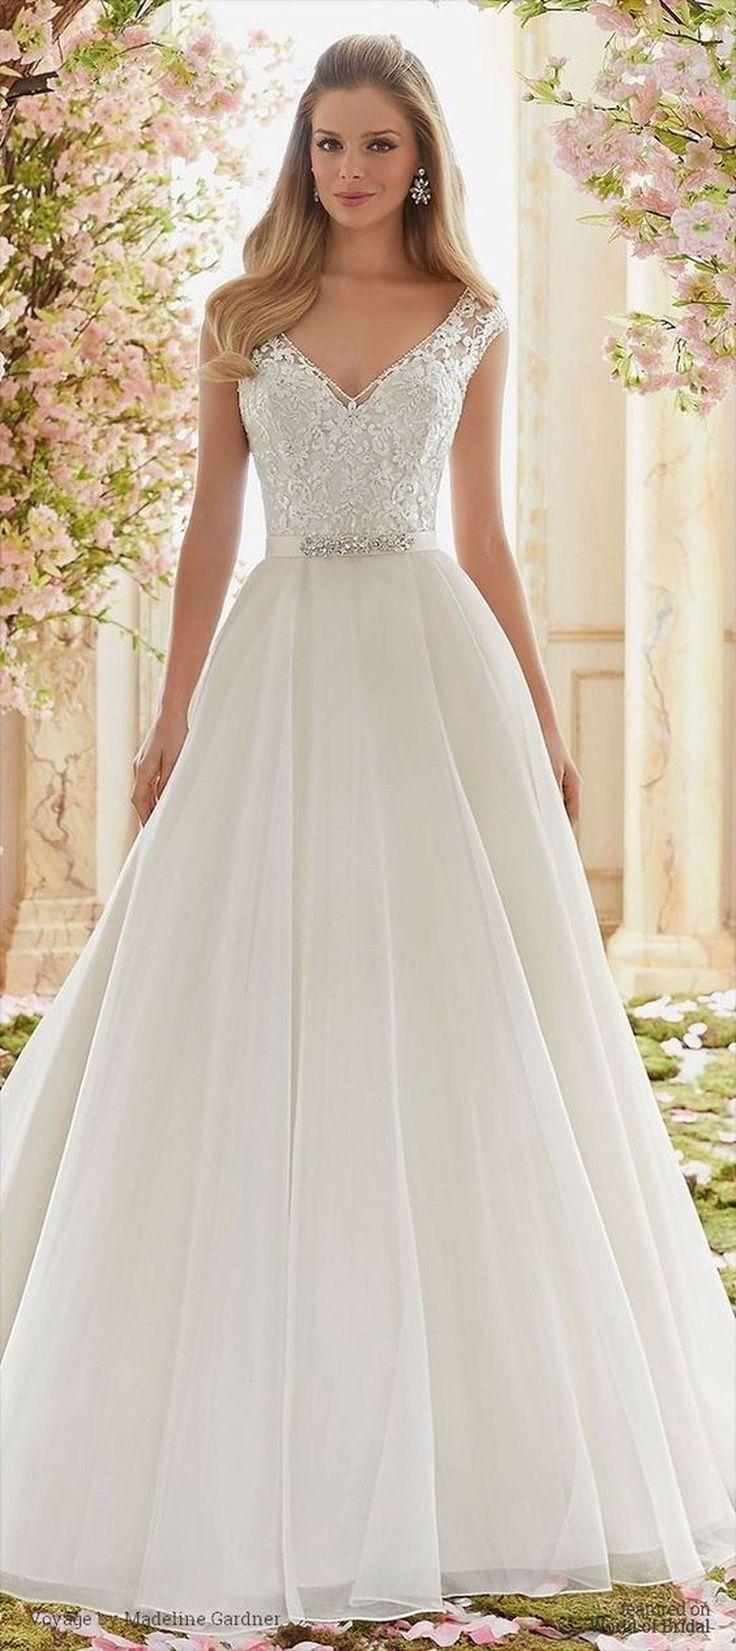 Best ideas for simple summer wedding dresses dresses ideas